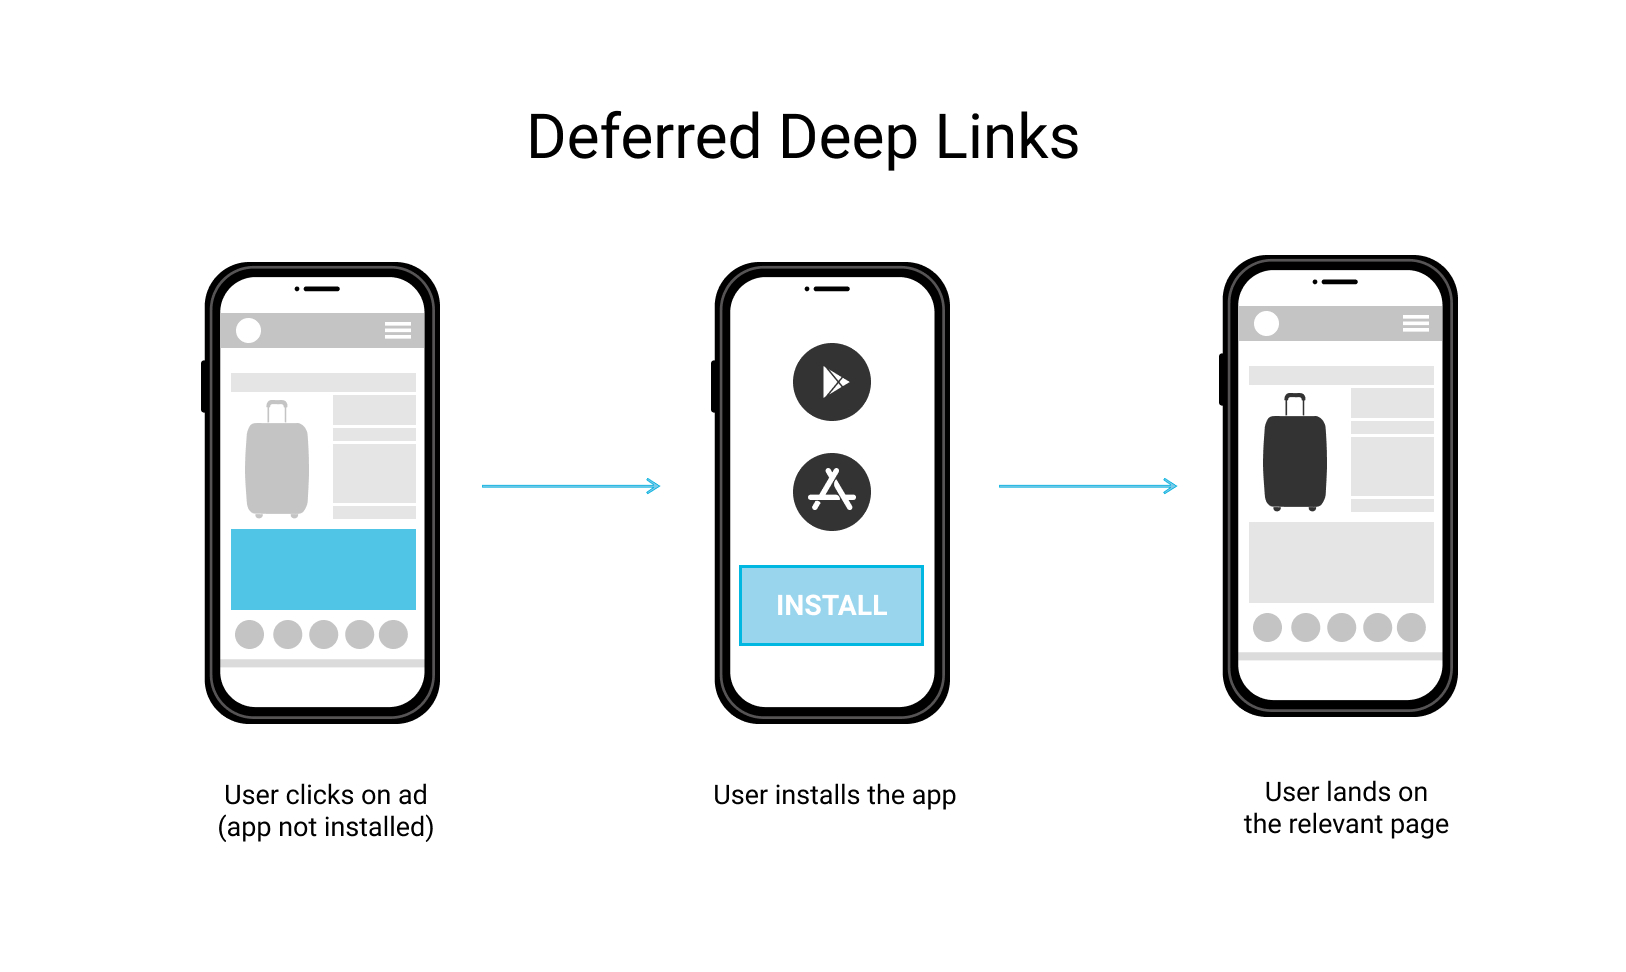 deferred deep links